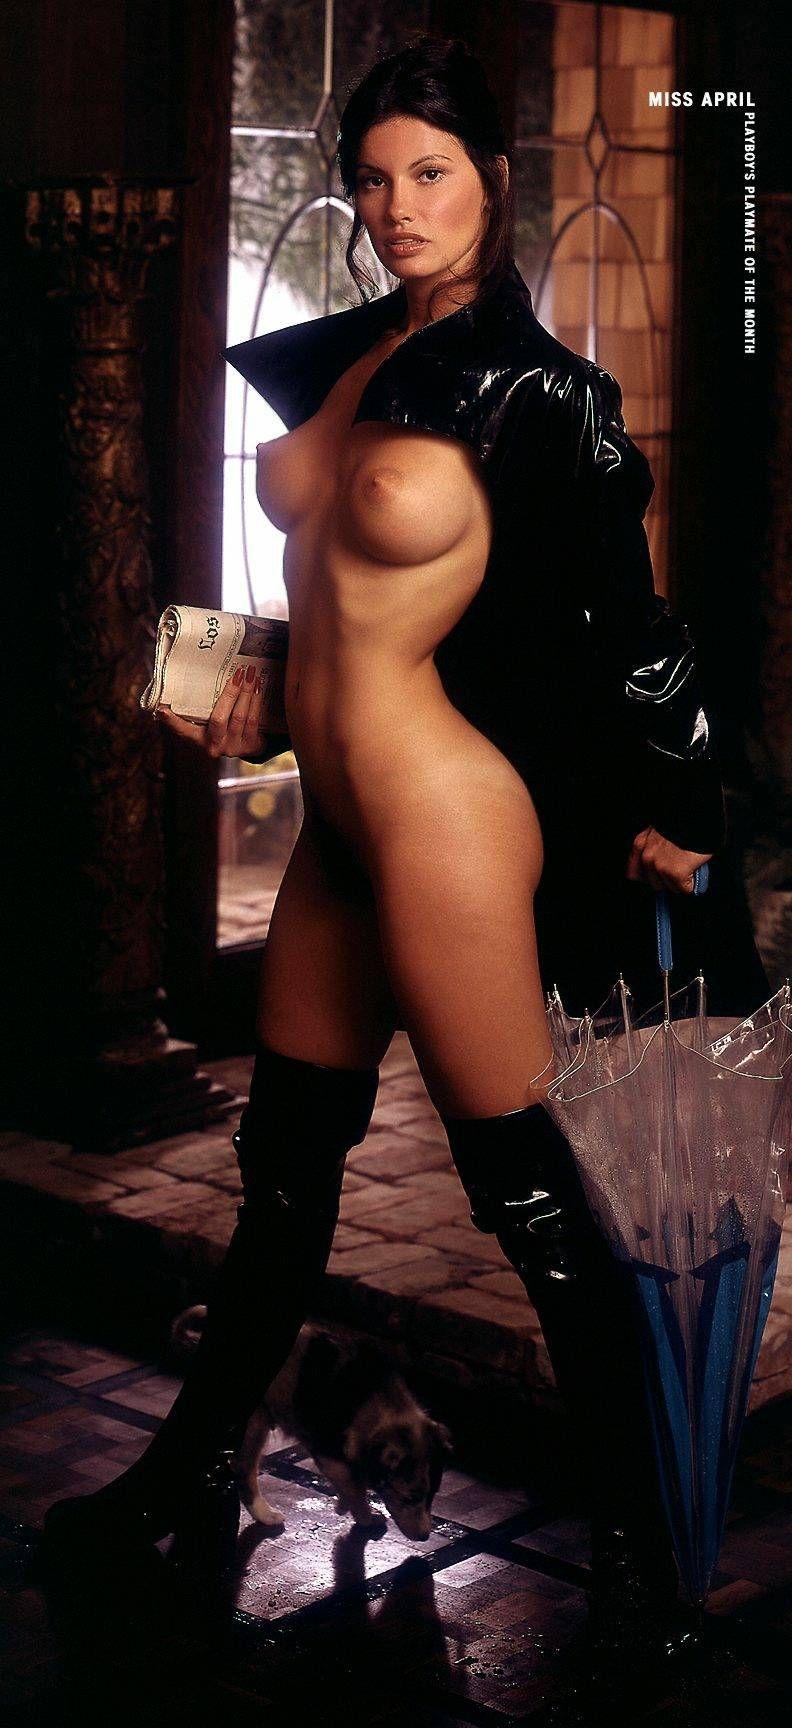 Девушки месяца журнала Playboy из 70х